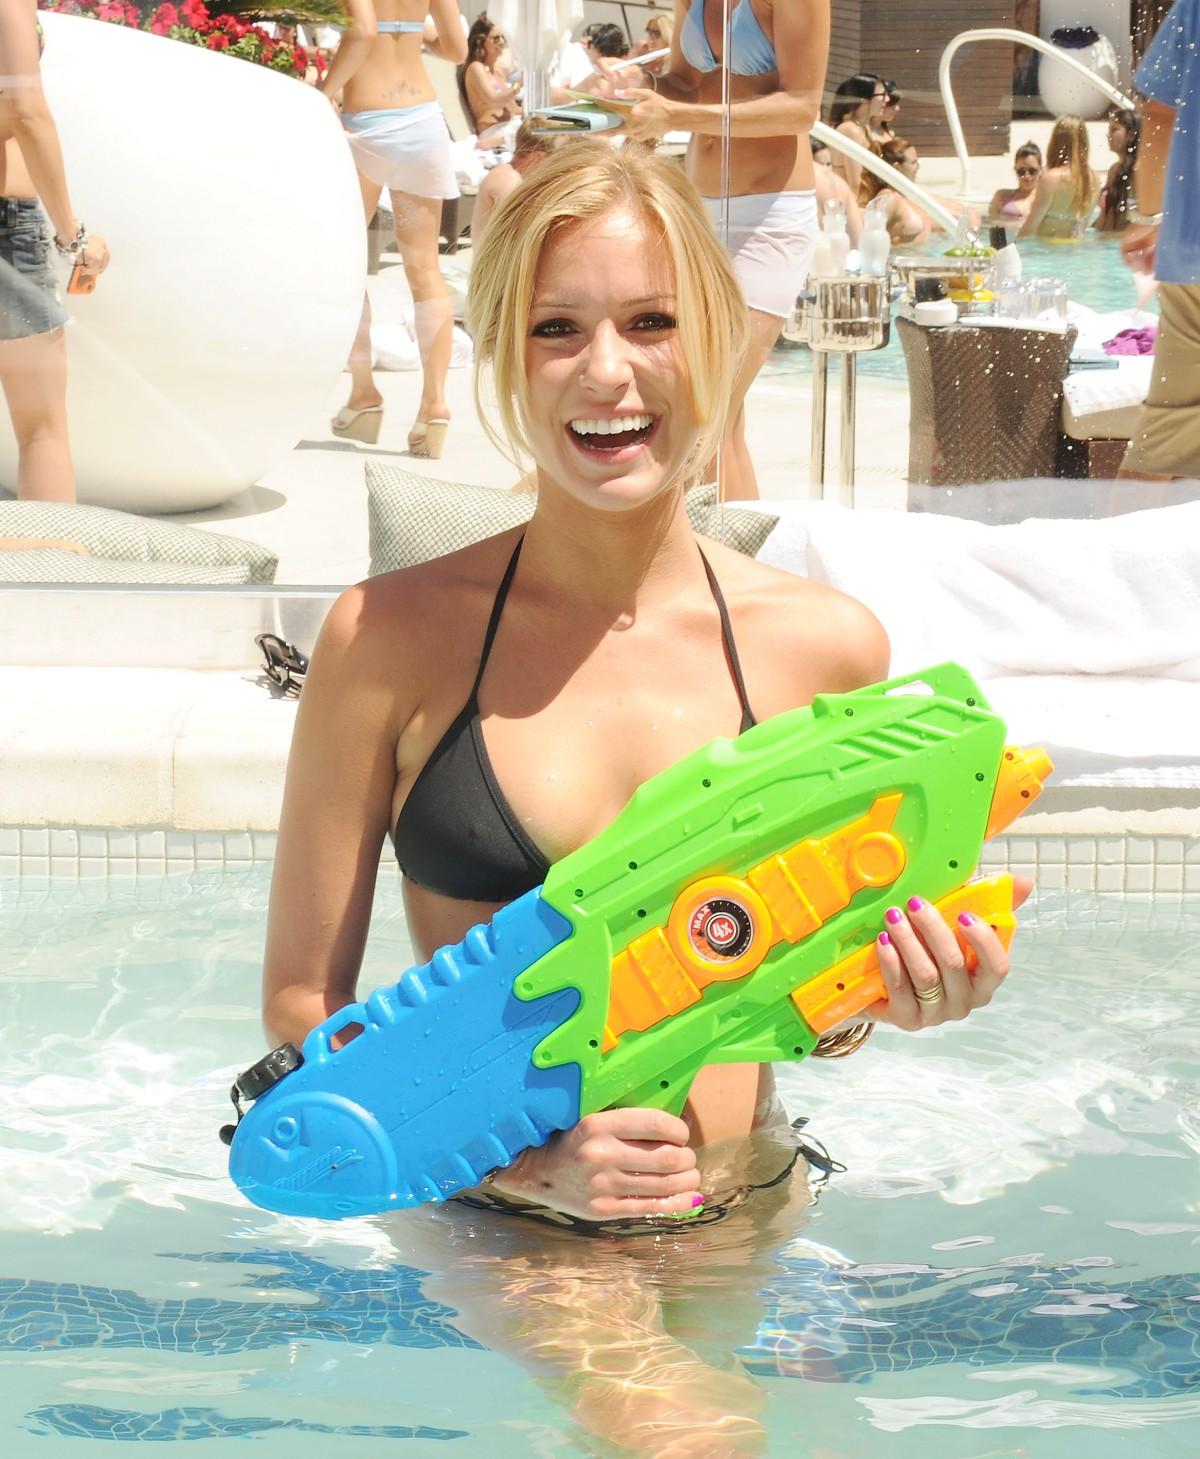 Kristin Cavallari : Une Hills girl sexy en bikini